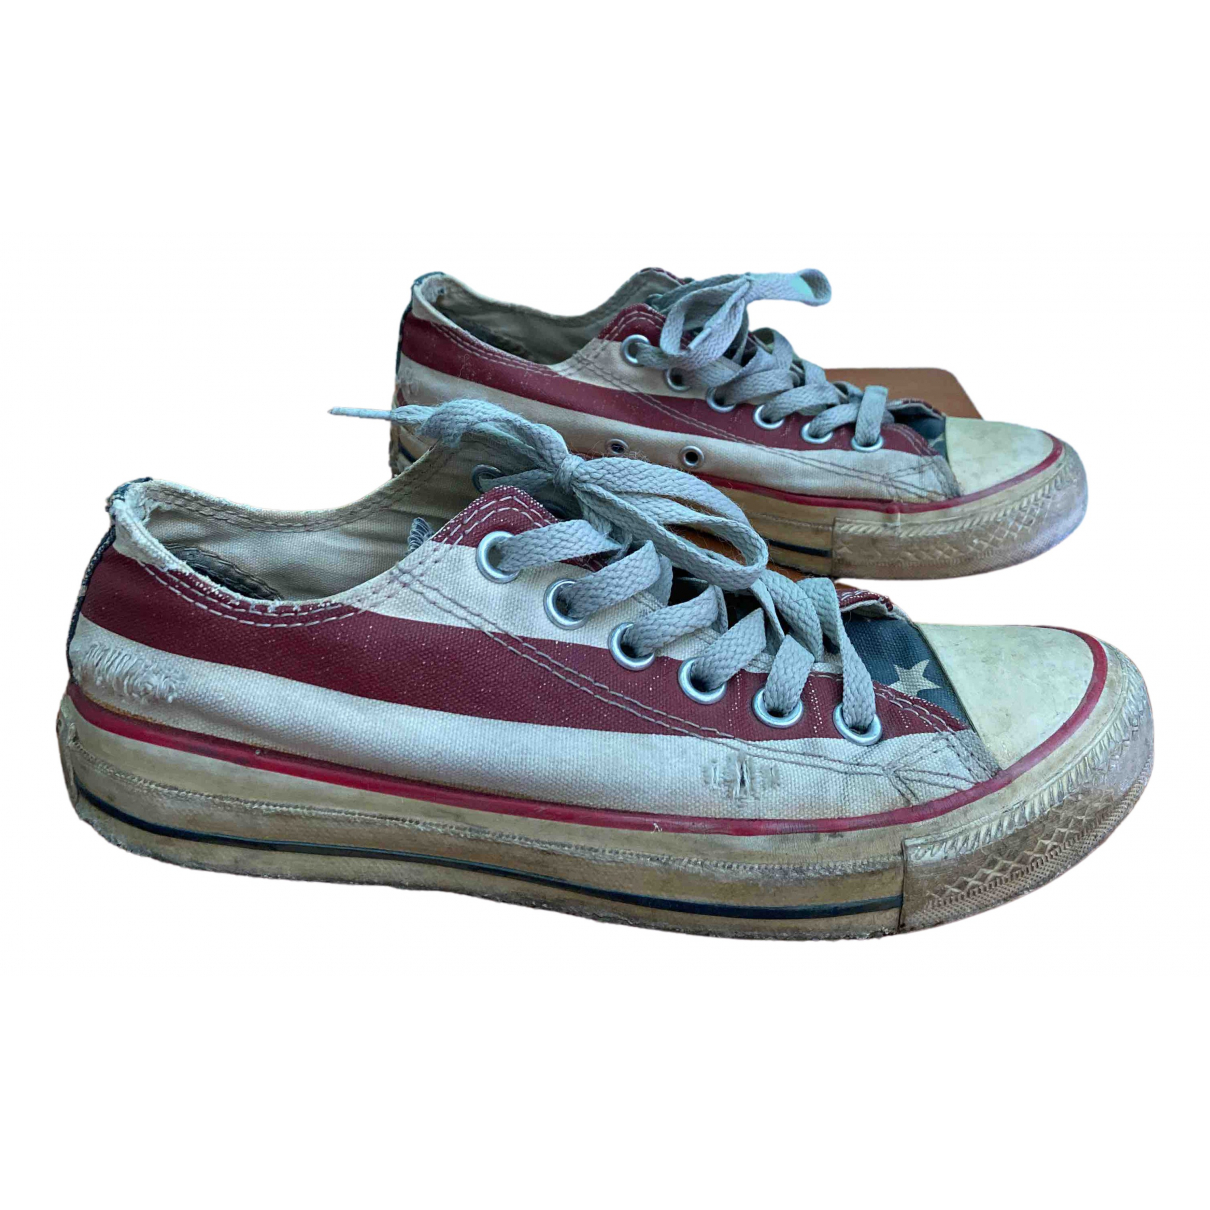 Converse \N Sneakers in  Beige Leinen